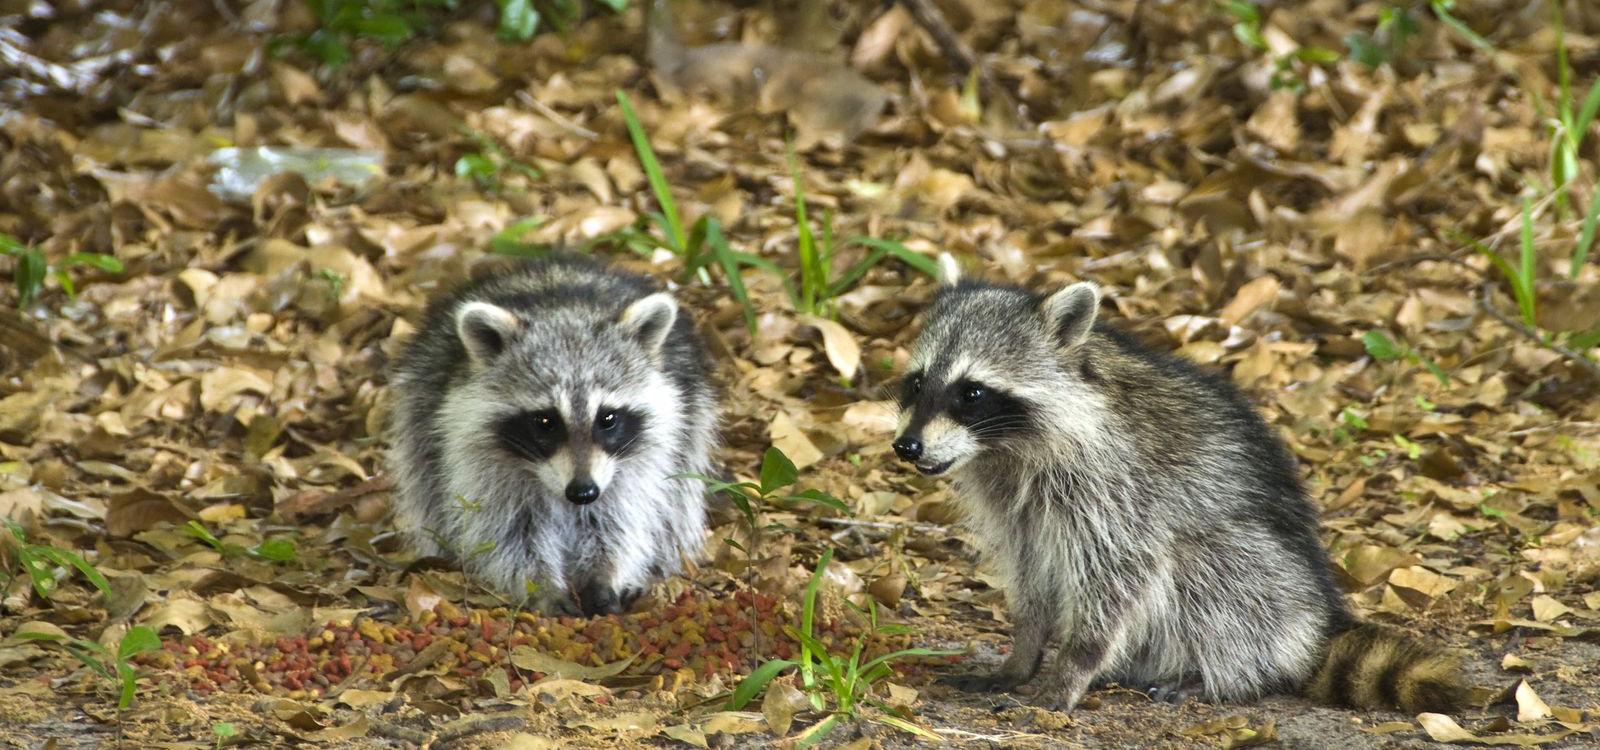 <div class='slider_caption'> <h1>Safe & Humane Wildlife Removal</h1><a class='slider-readmore' href=''>Read More</a>   </div>